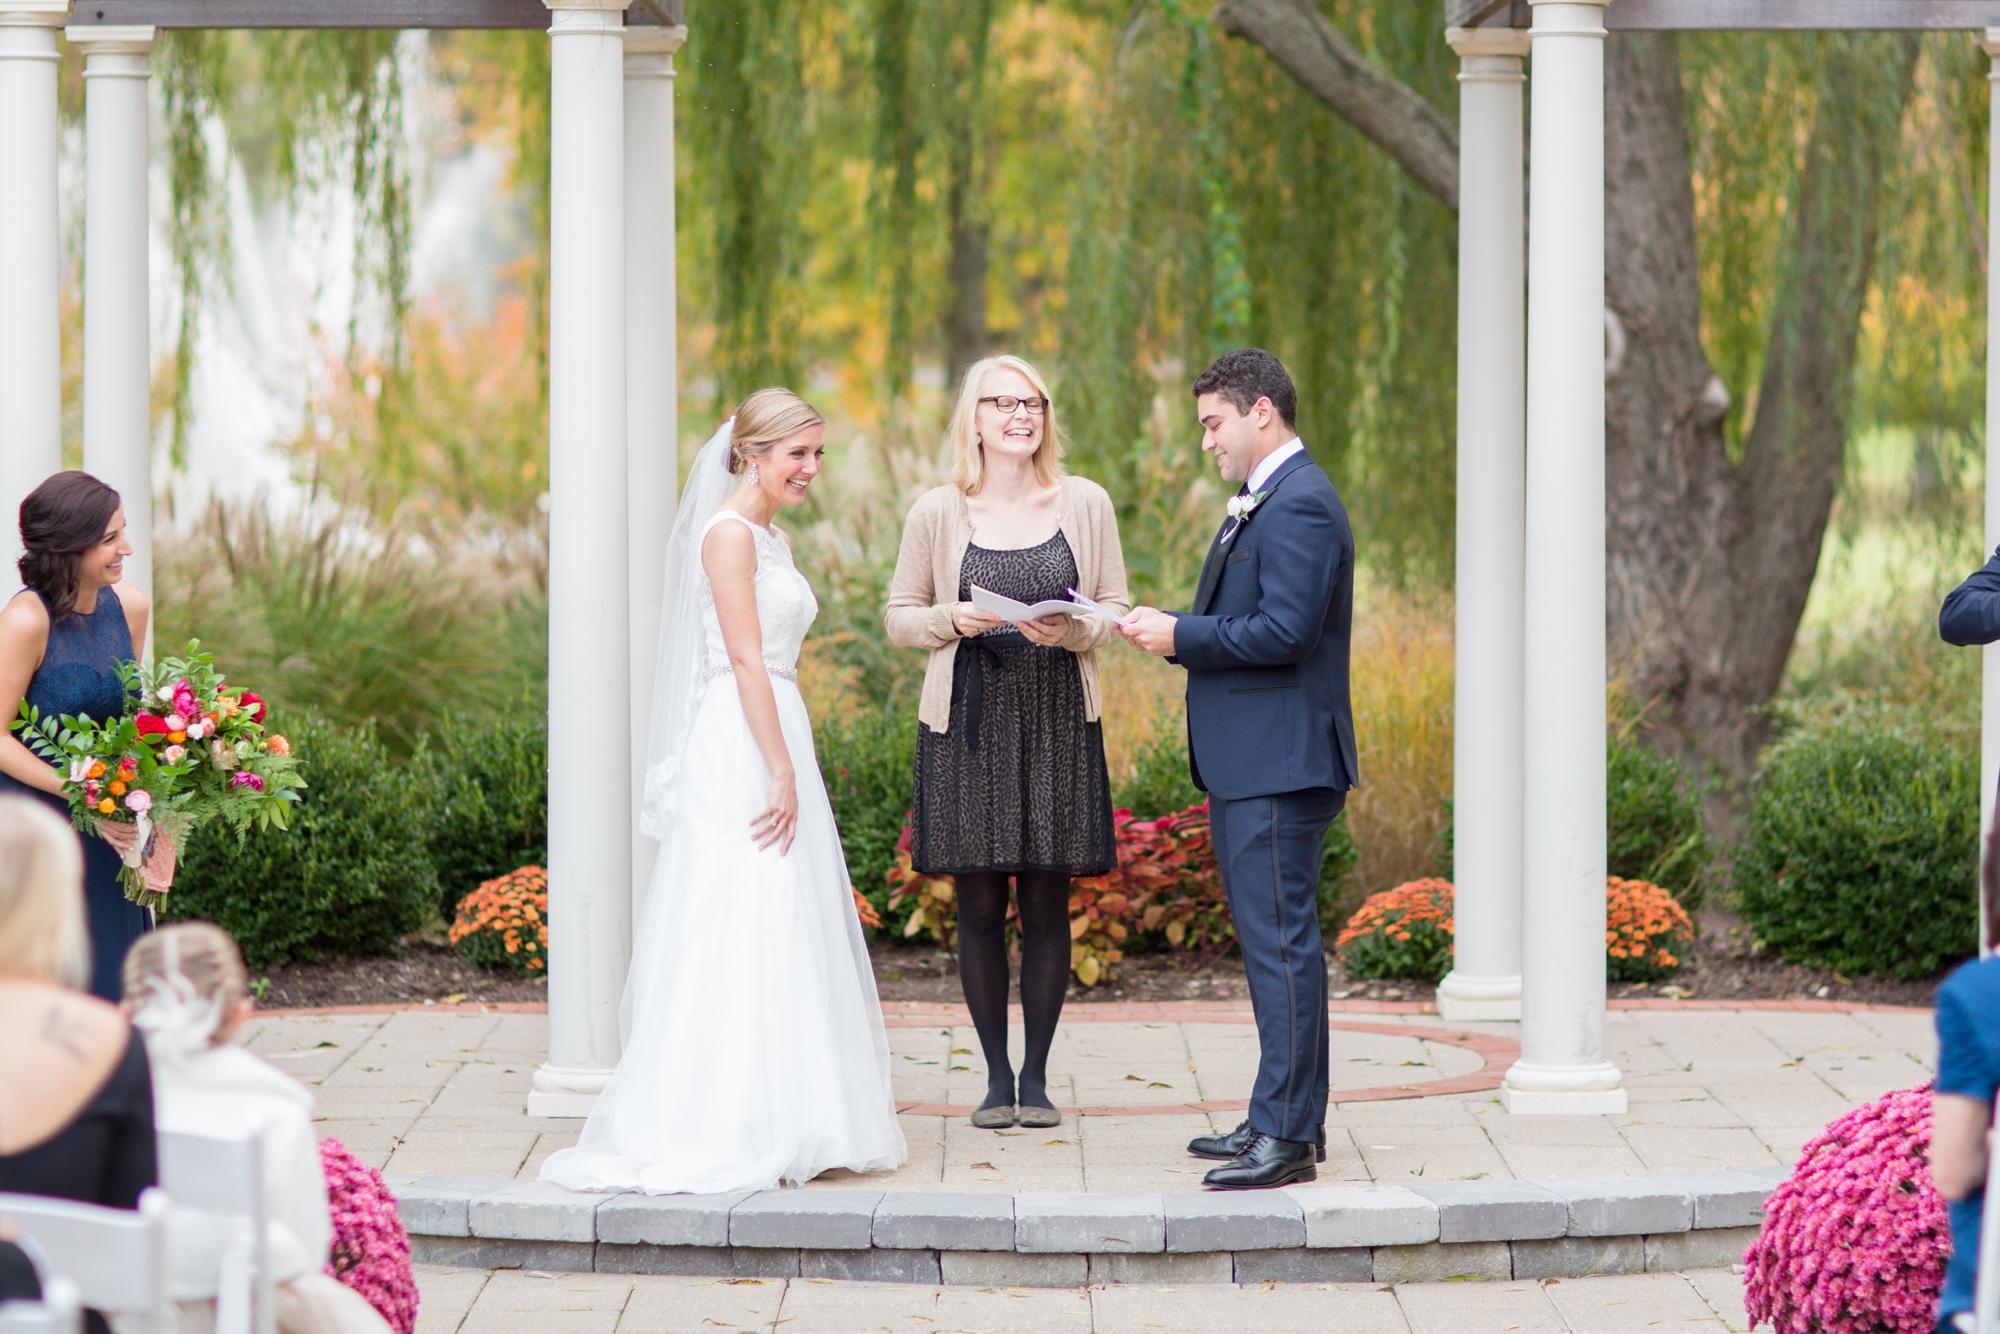 5-Finkel Wedding Ceremony-660_anna grace photography maryland wedding photographer turf valley.jpg